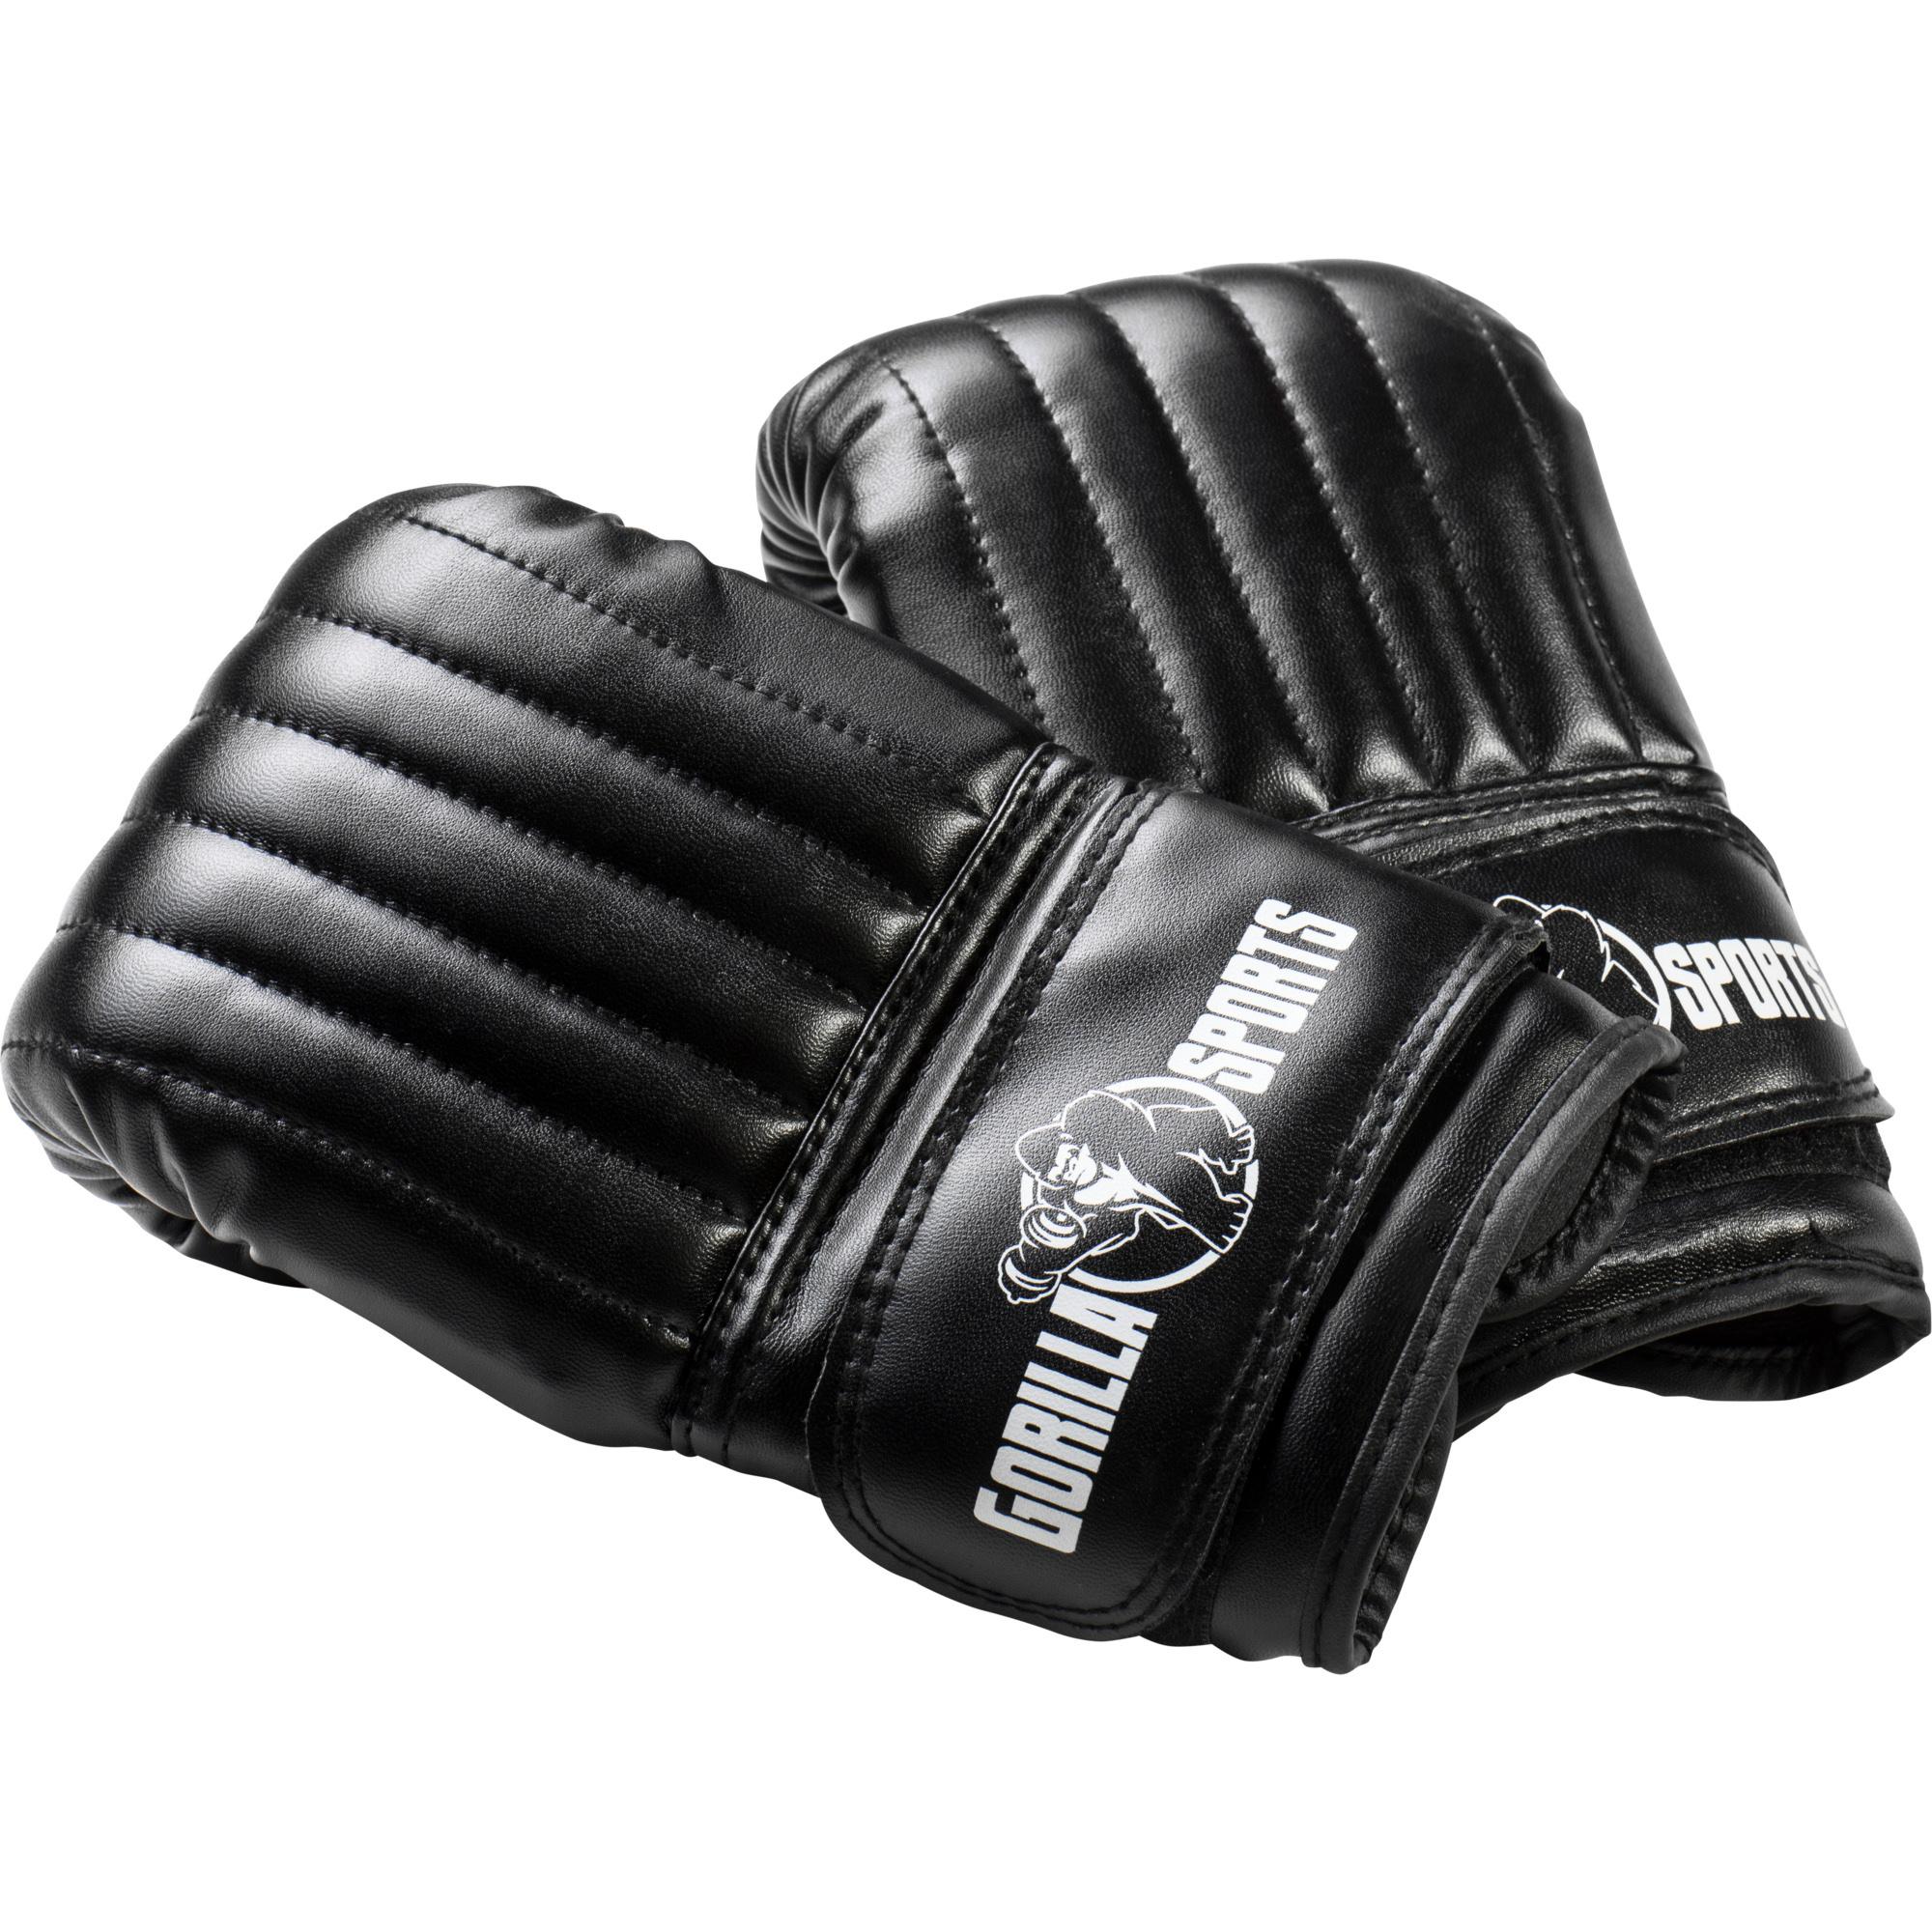 Boxhandschuhe dünn schwarz M